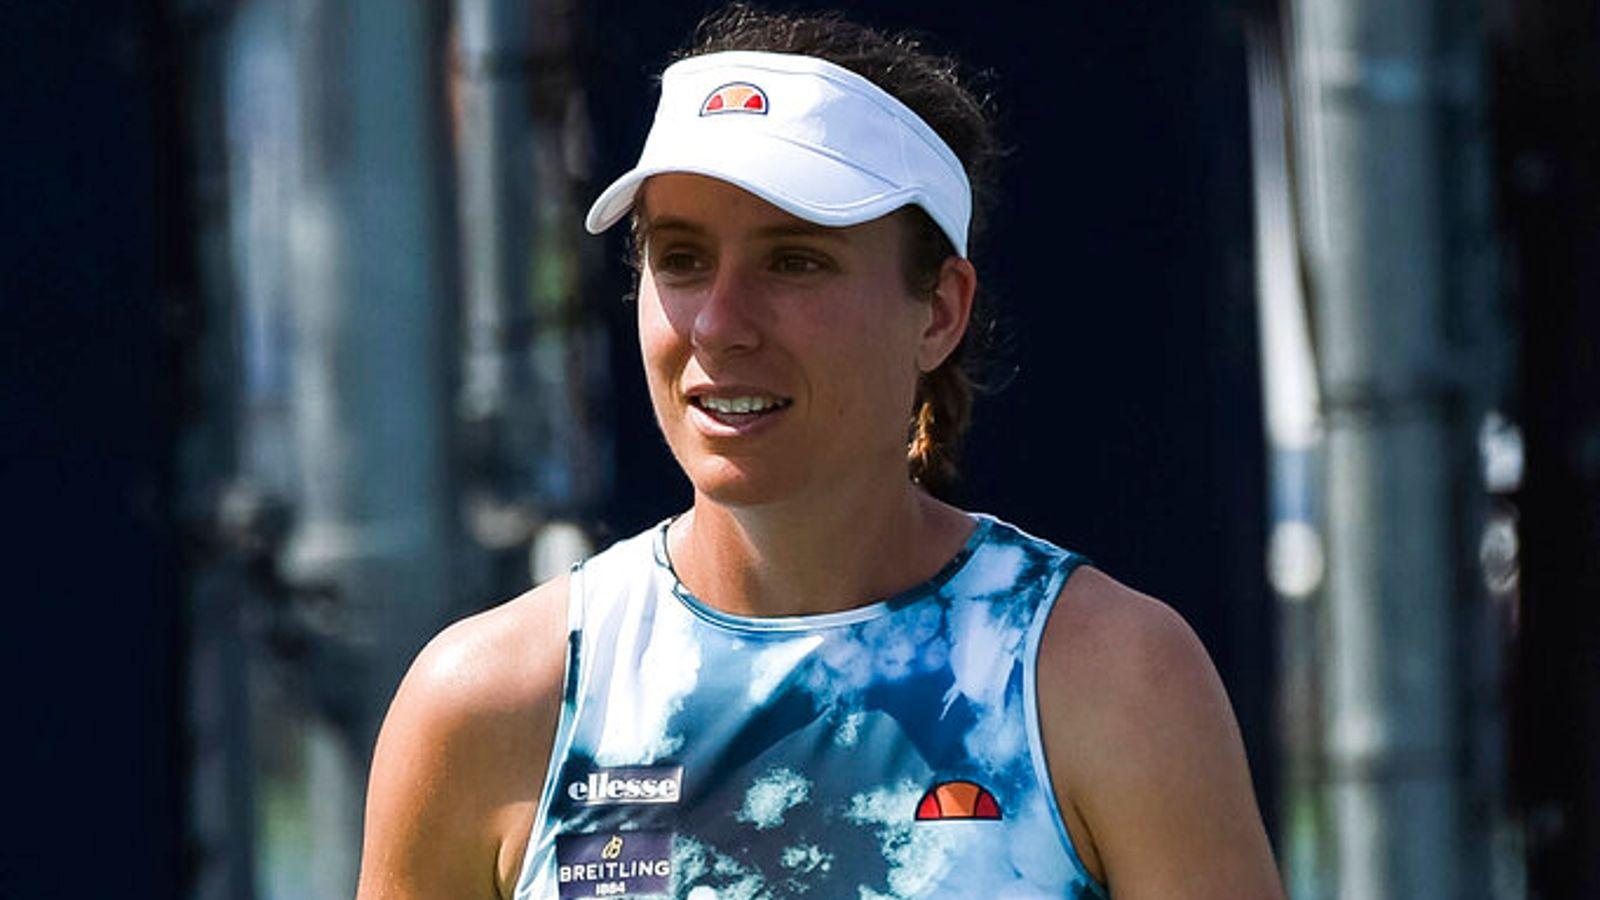 Johanna Konta dealt with a 'massive range of symptoms' after catching COVID-19